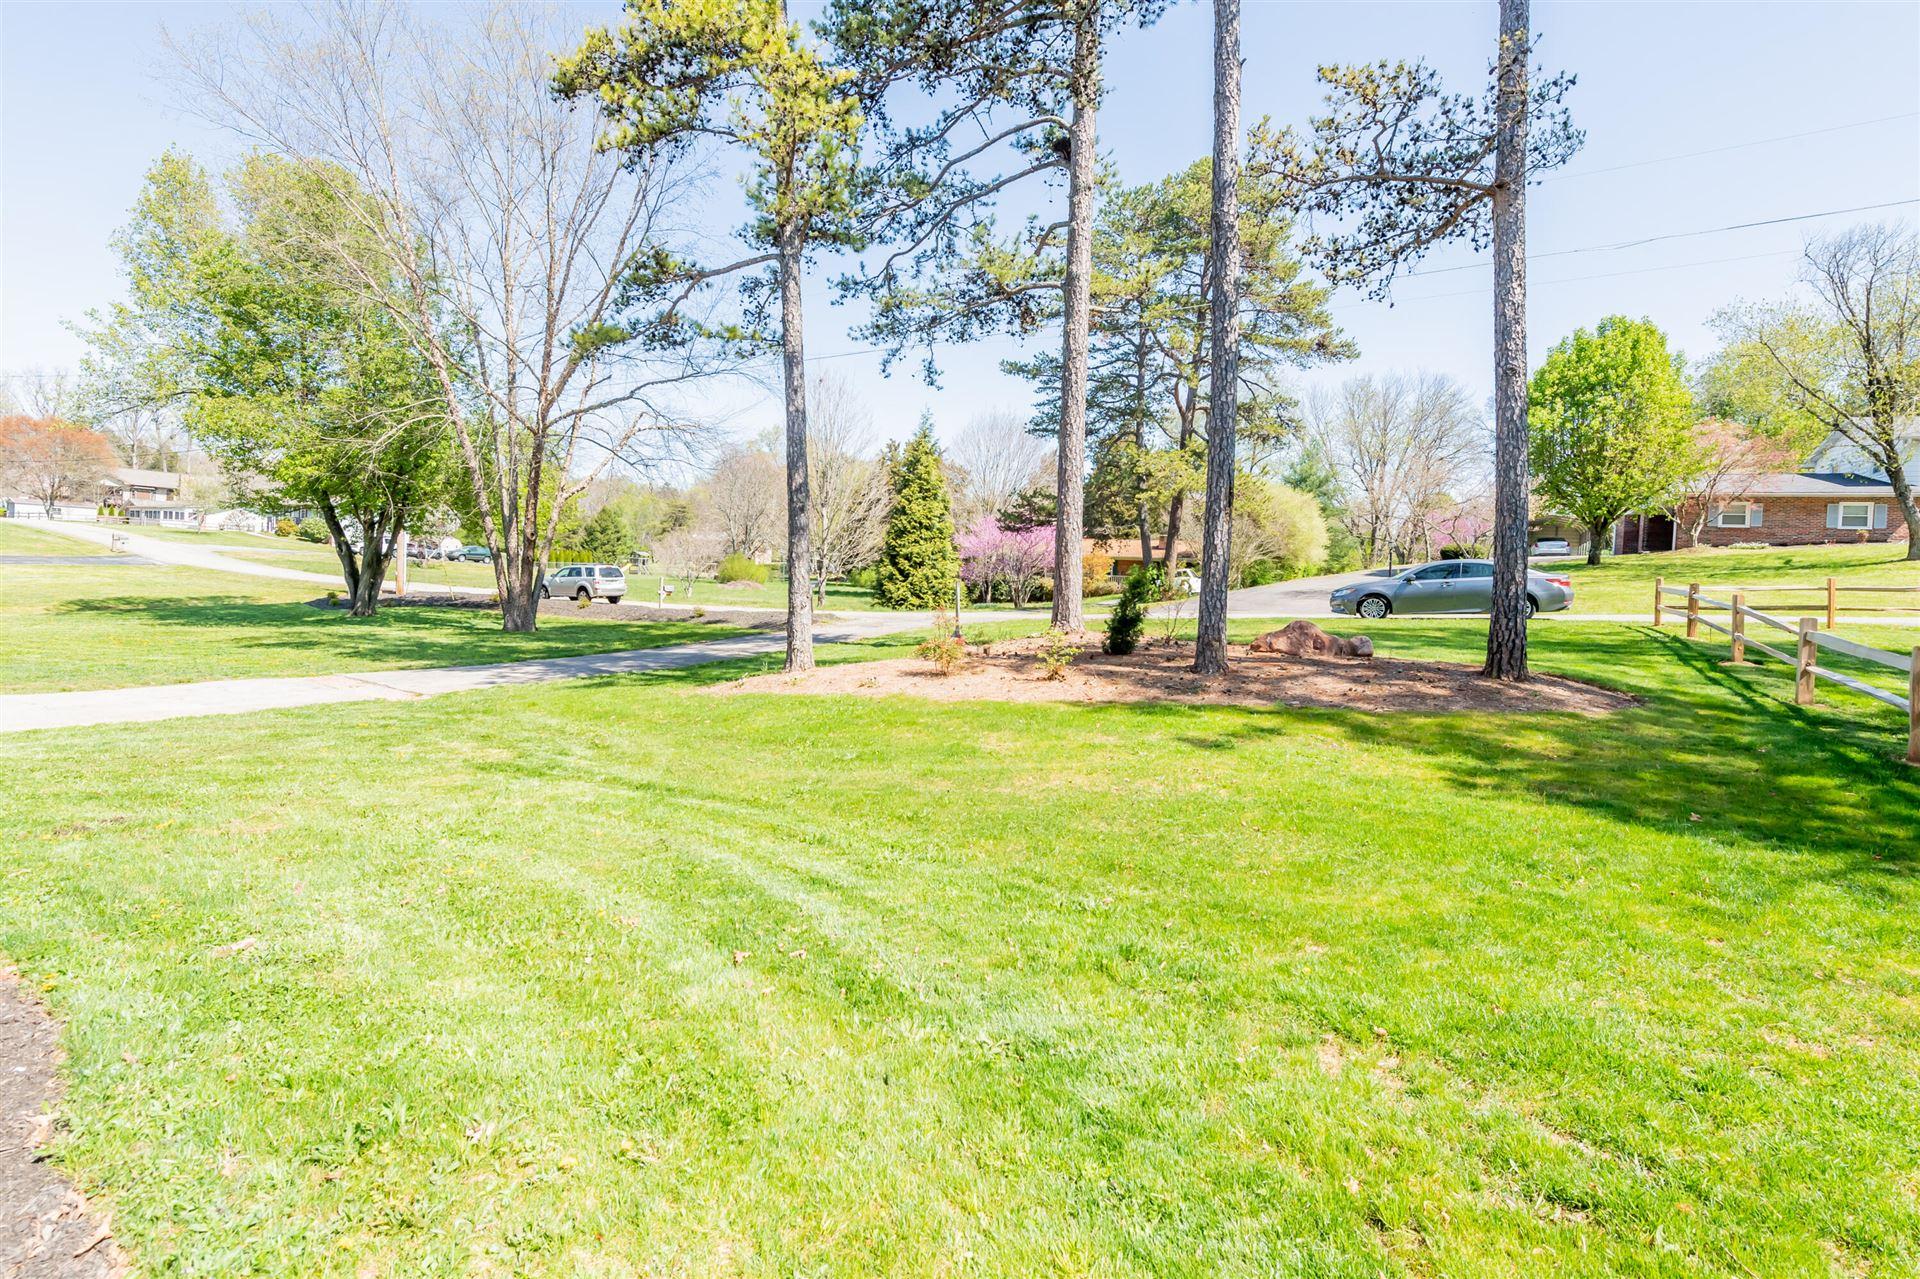 Photo of 2940 Dixie Lee Circle, Lenoir City, TN 37772 (MLS # 1148774)